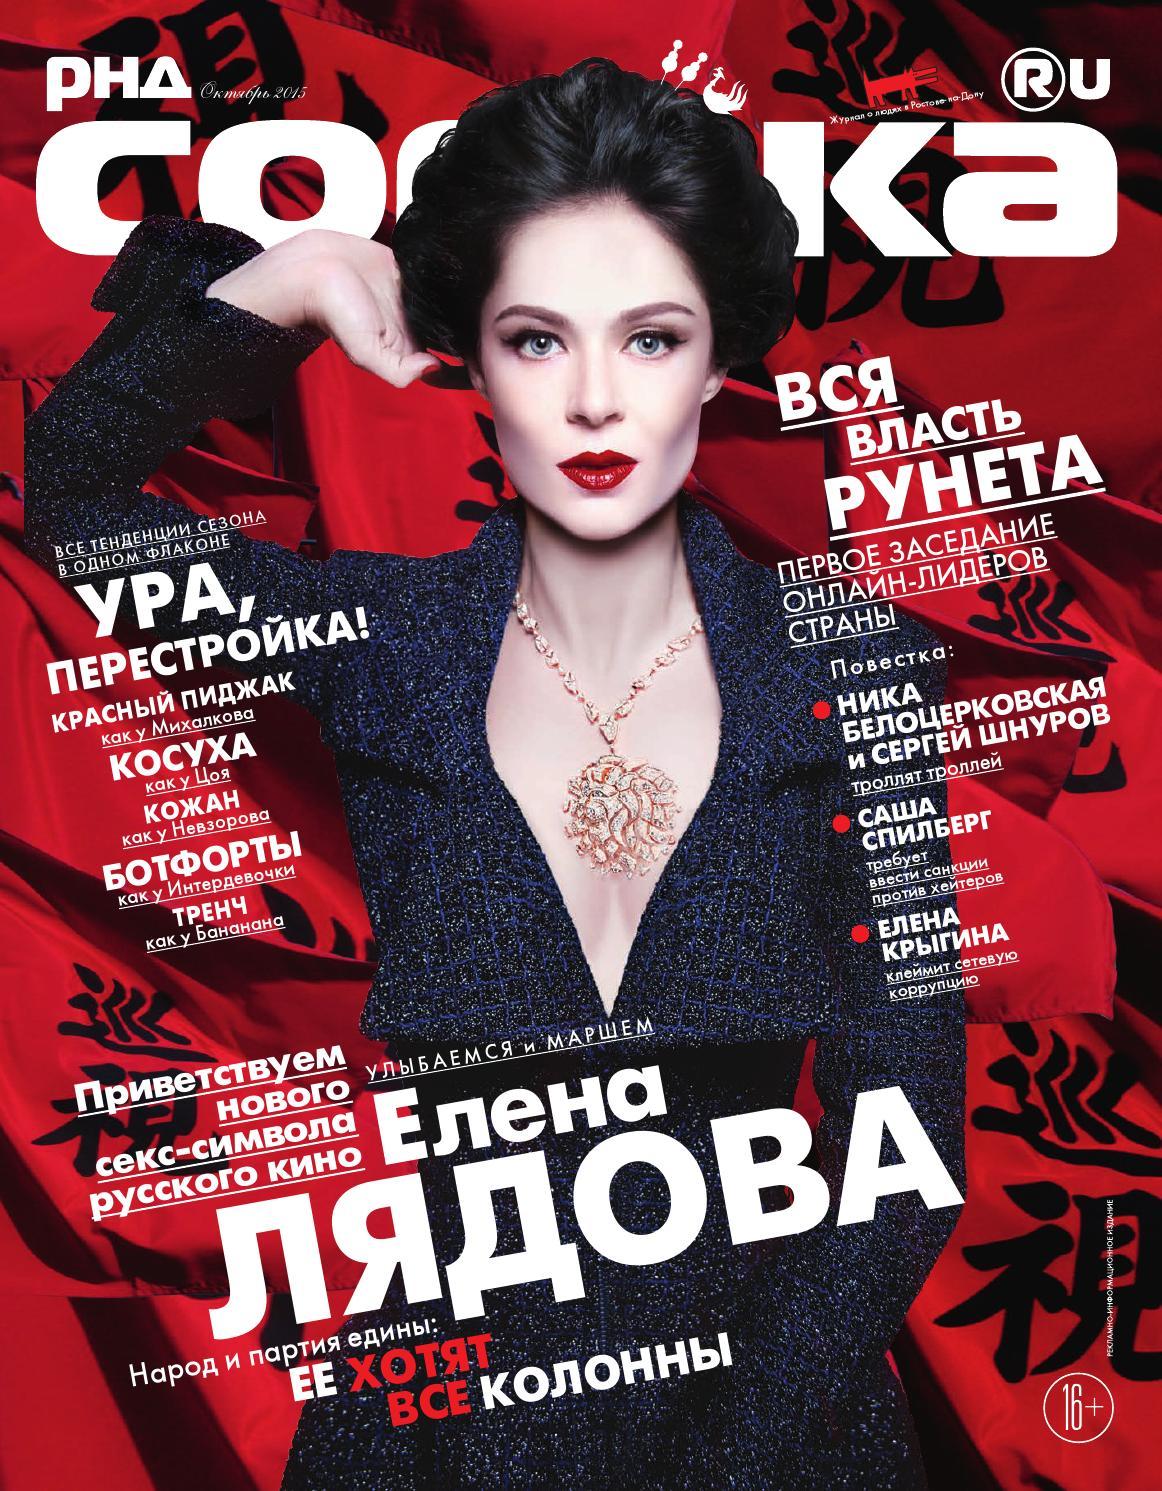 Секс втроём по-русски